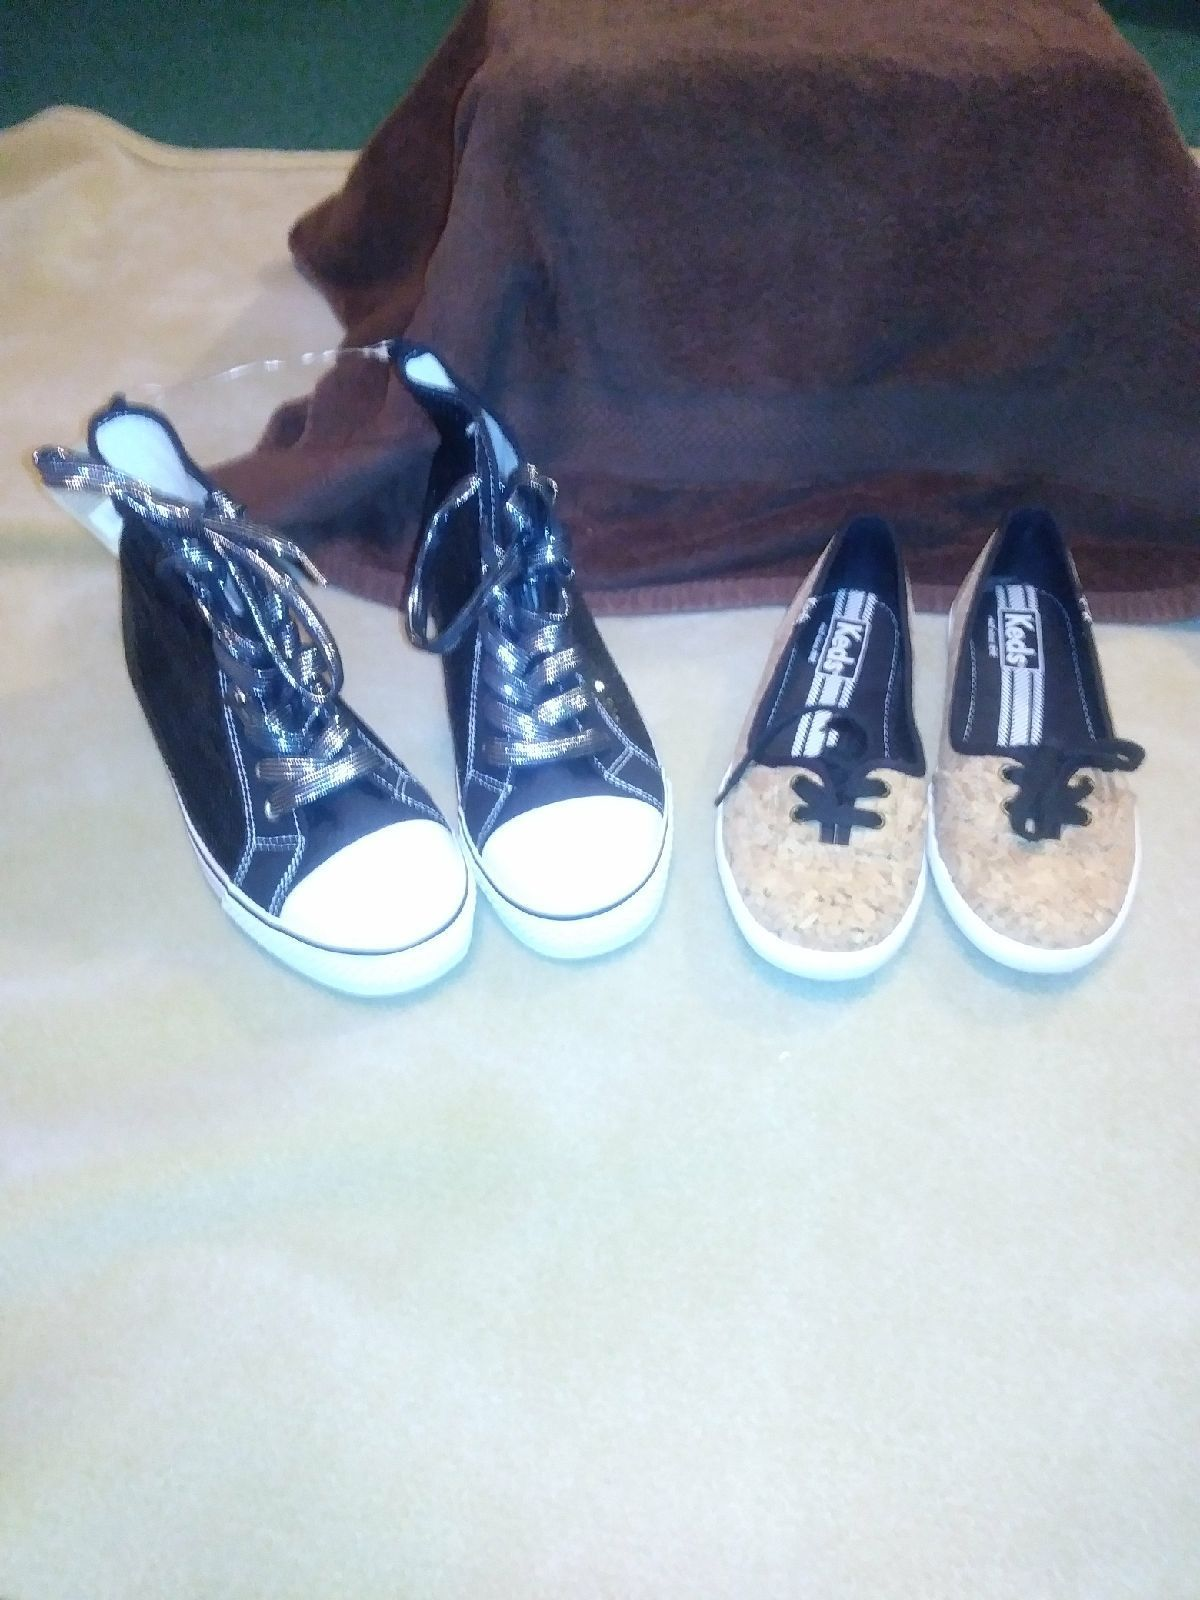 Two Pair Tennis Shoes Mercari Things You Love